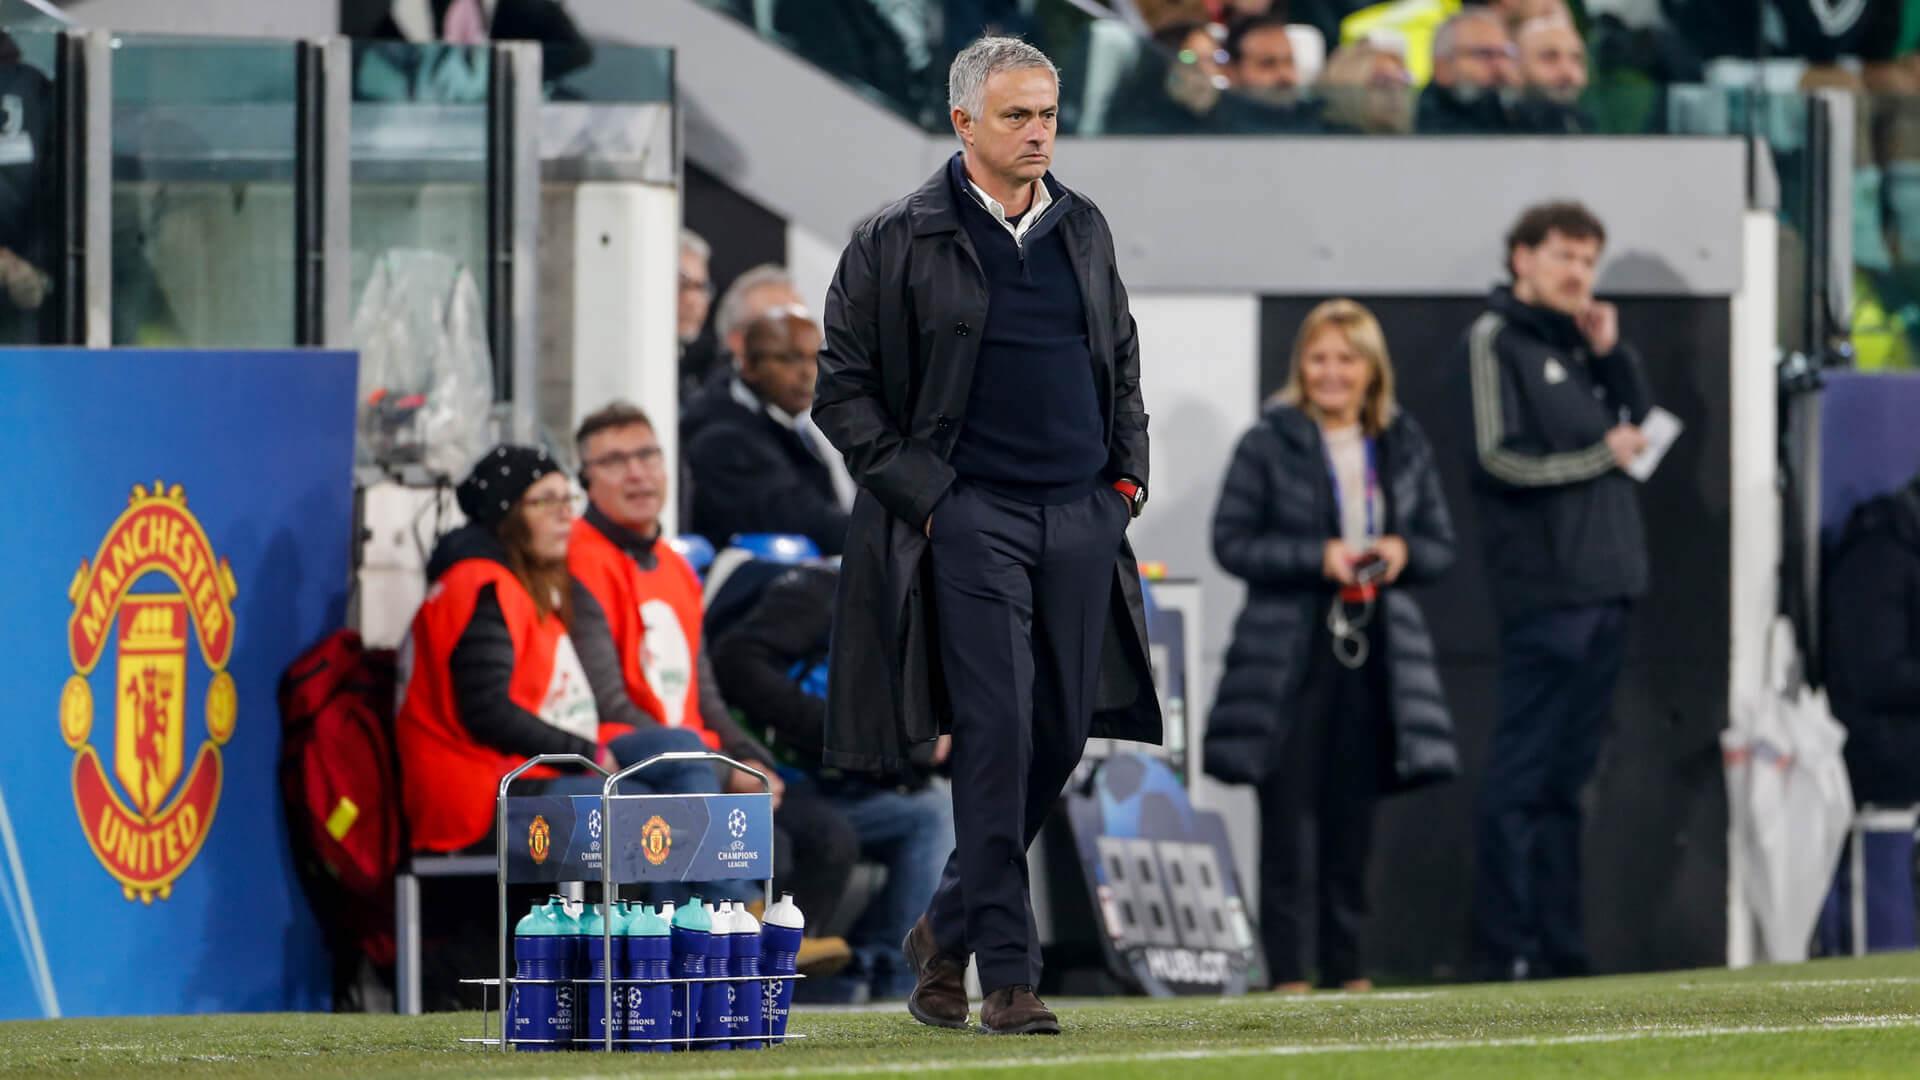 Jose Mourinho wskazuje herb